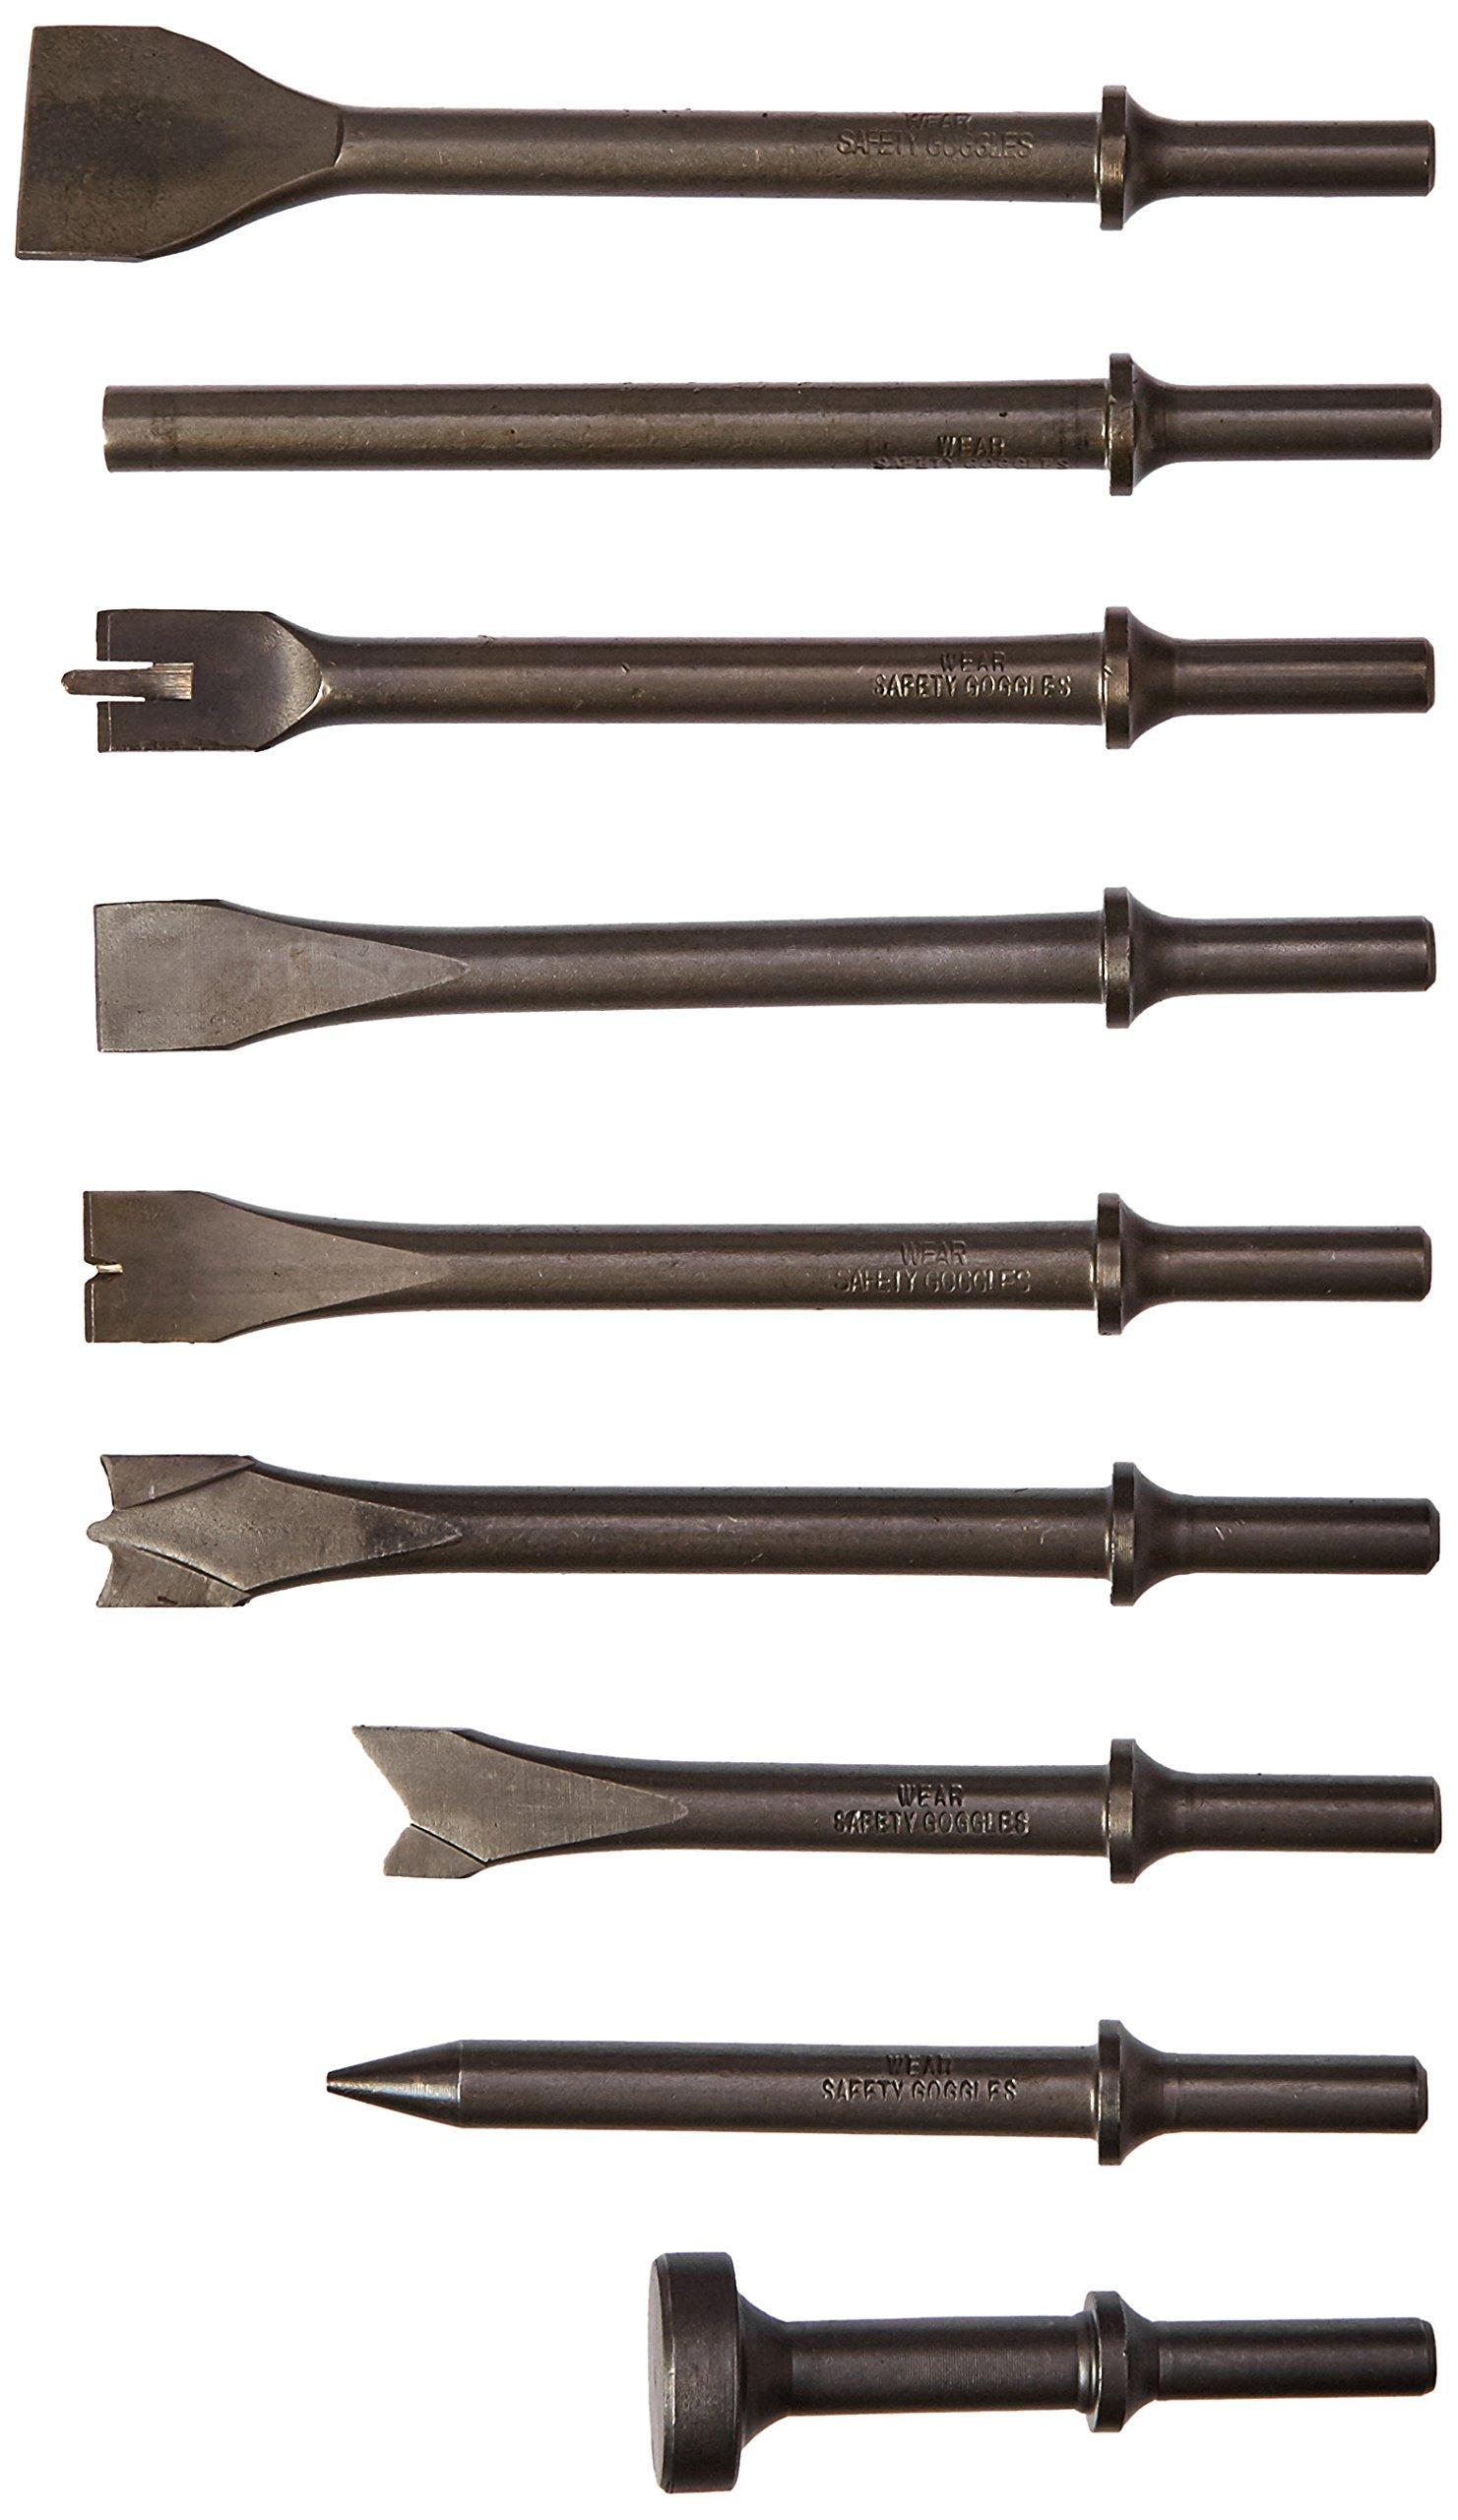 Advanced Tool Design Model ATD-5730 9 Piece All Purpose Chisel Set